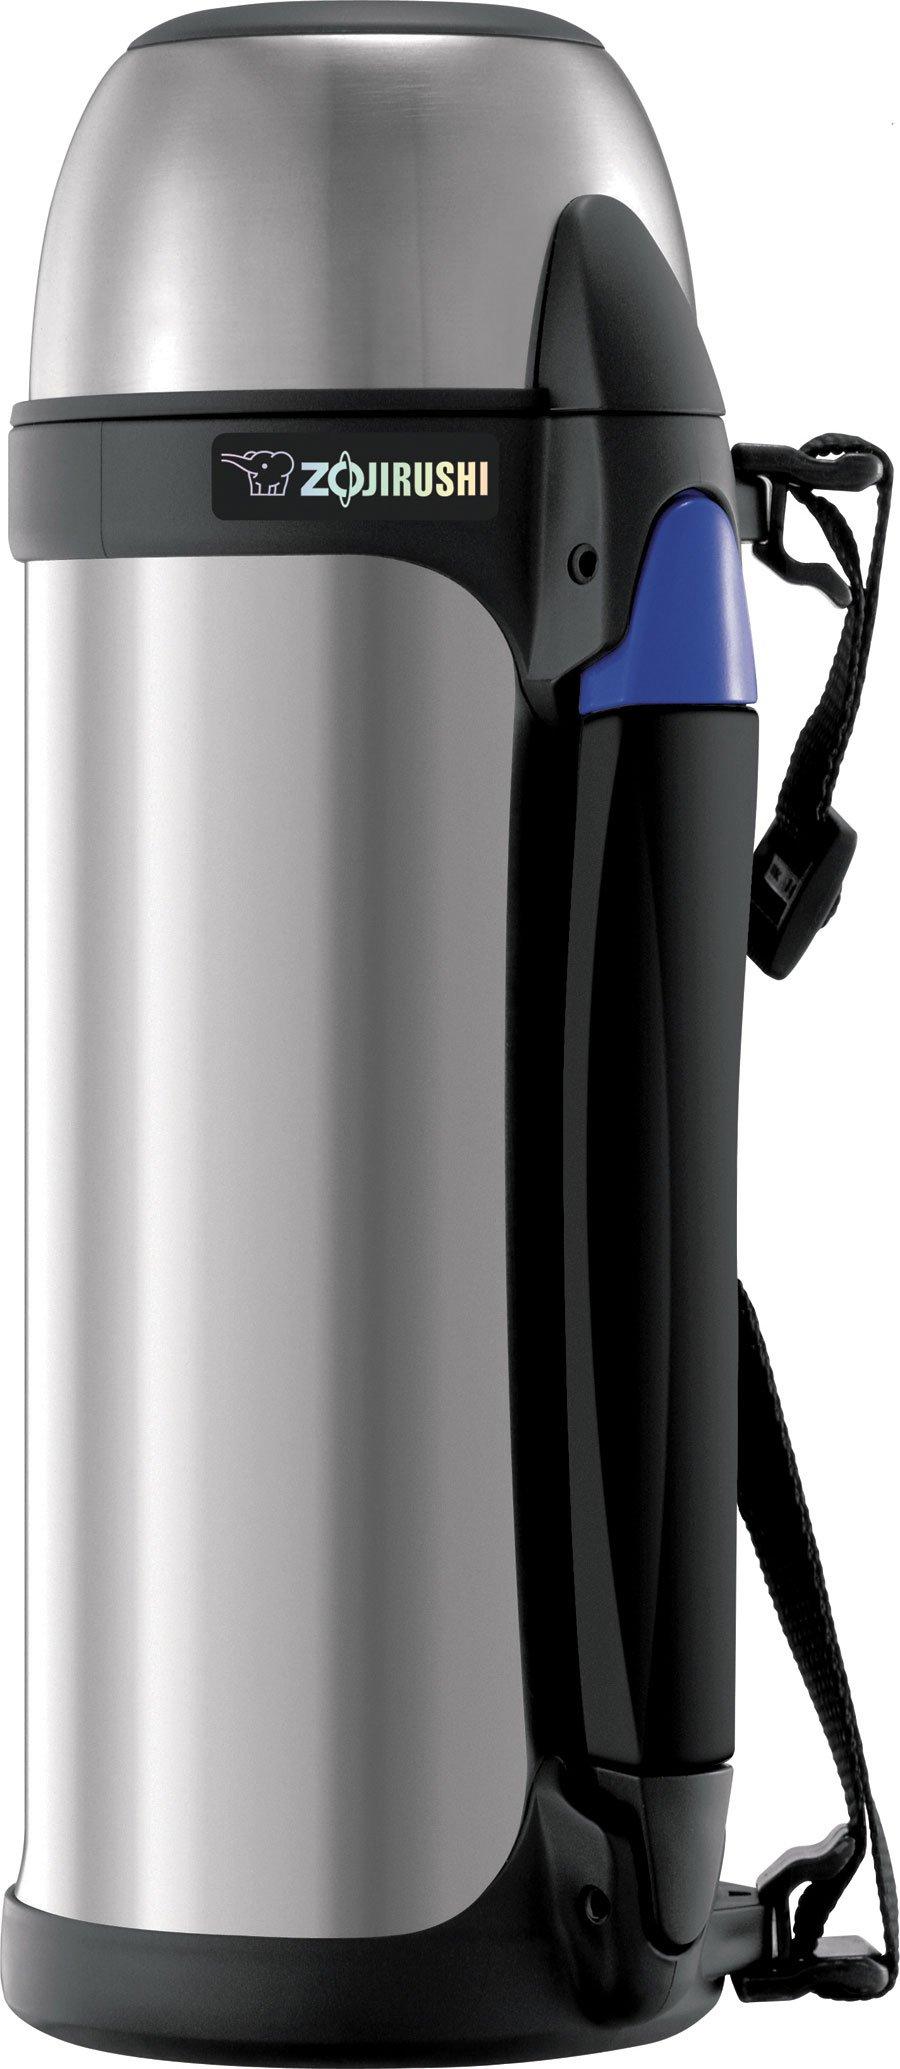 Zojirushi SJ-SHE10 Stainless Steel Tuff Sports Bottle, 32-Ounce